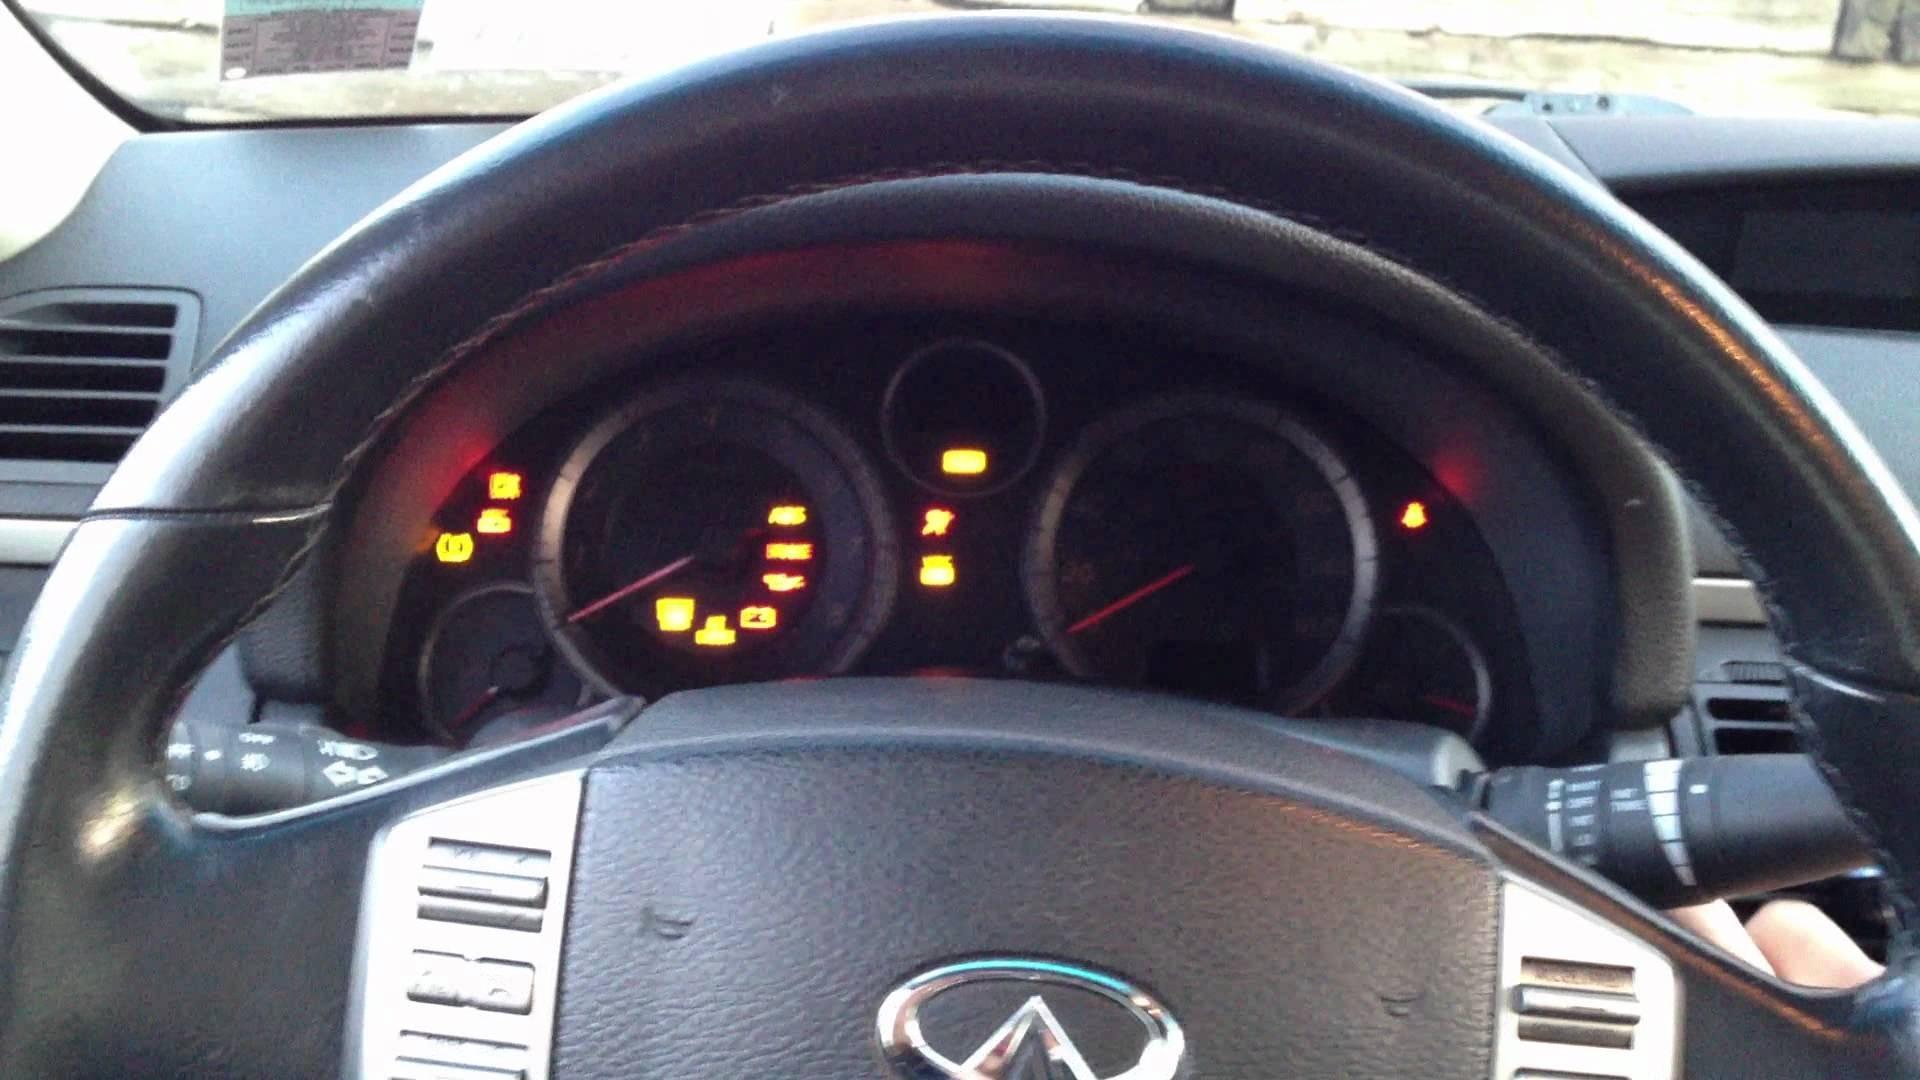 2003 Infiniti G35 Engine Diagram 2006 Infiniti G35 Car Won T Start Of 2003 Infiniti G35 Engine Diagram